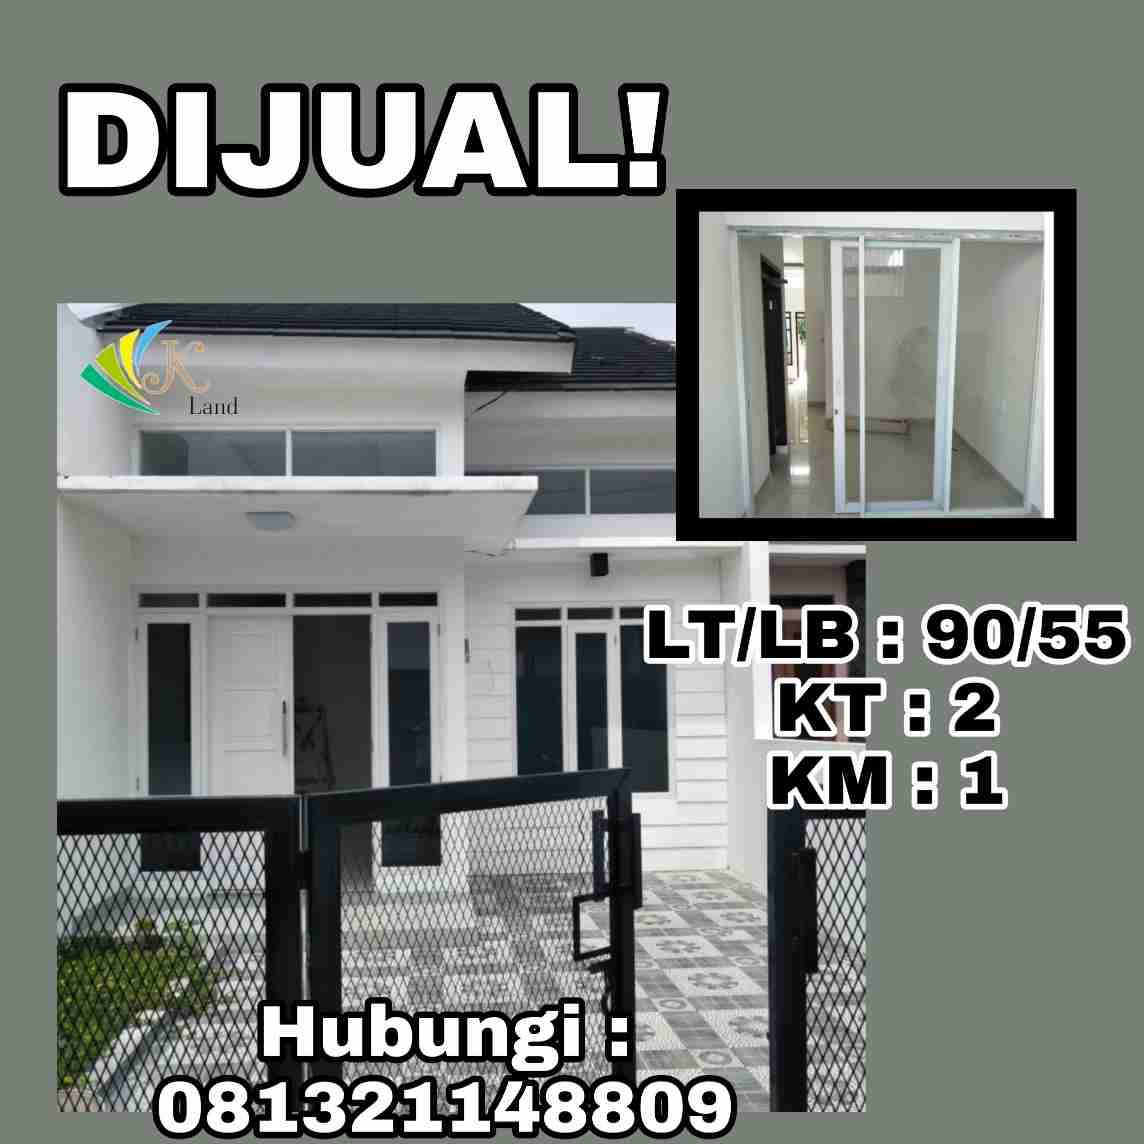 Dijual Rumah Baru Minimalis Di Bandung